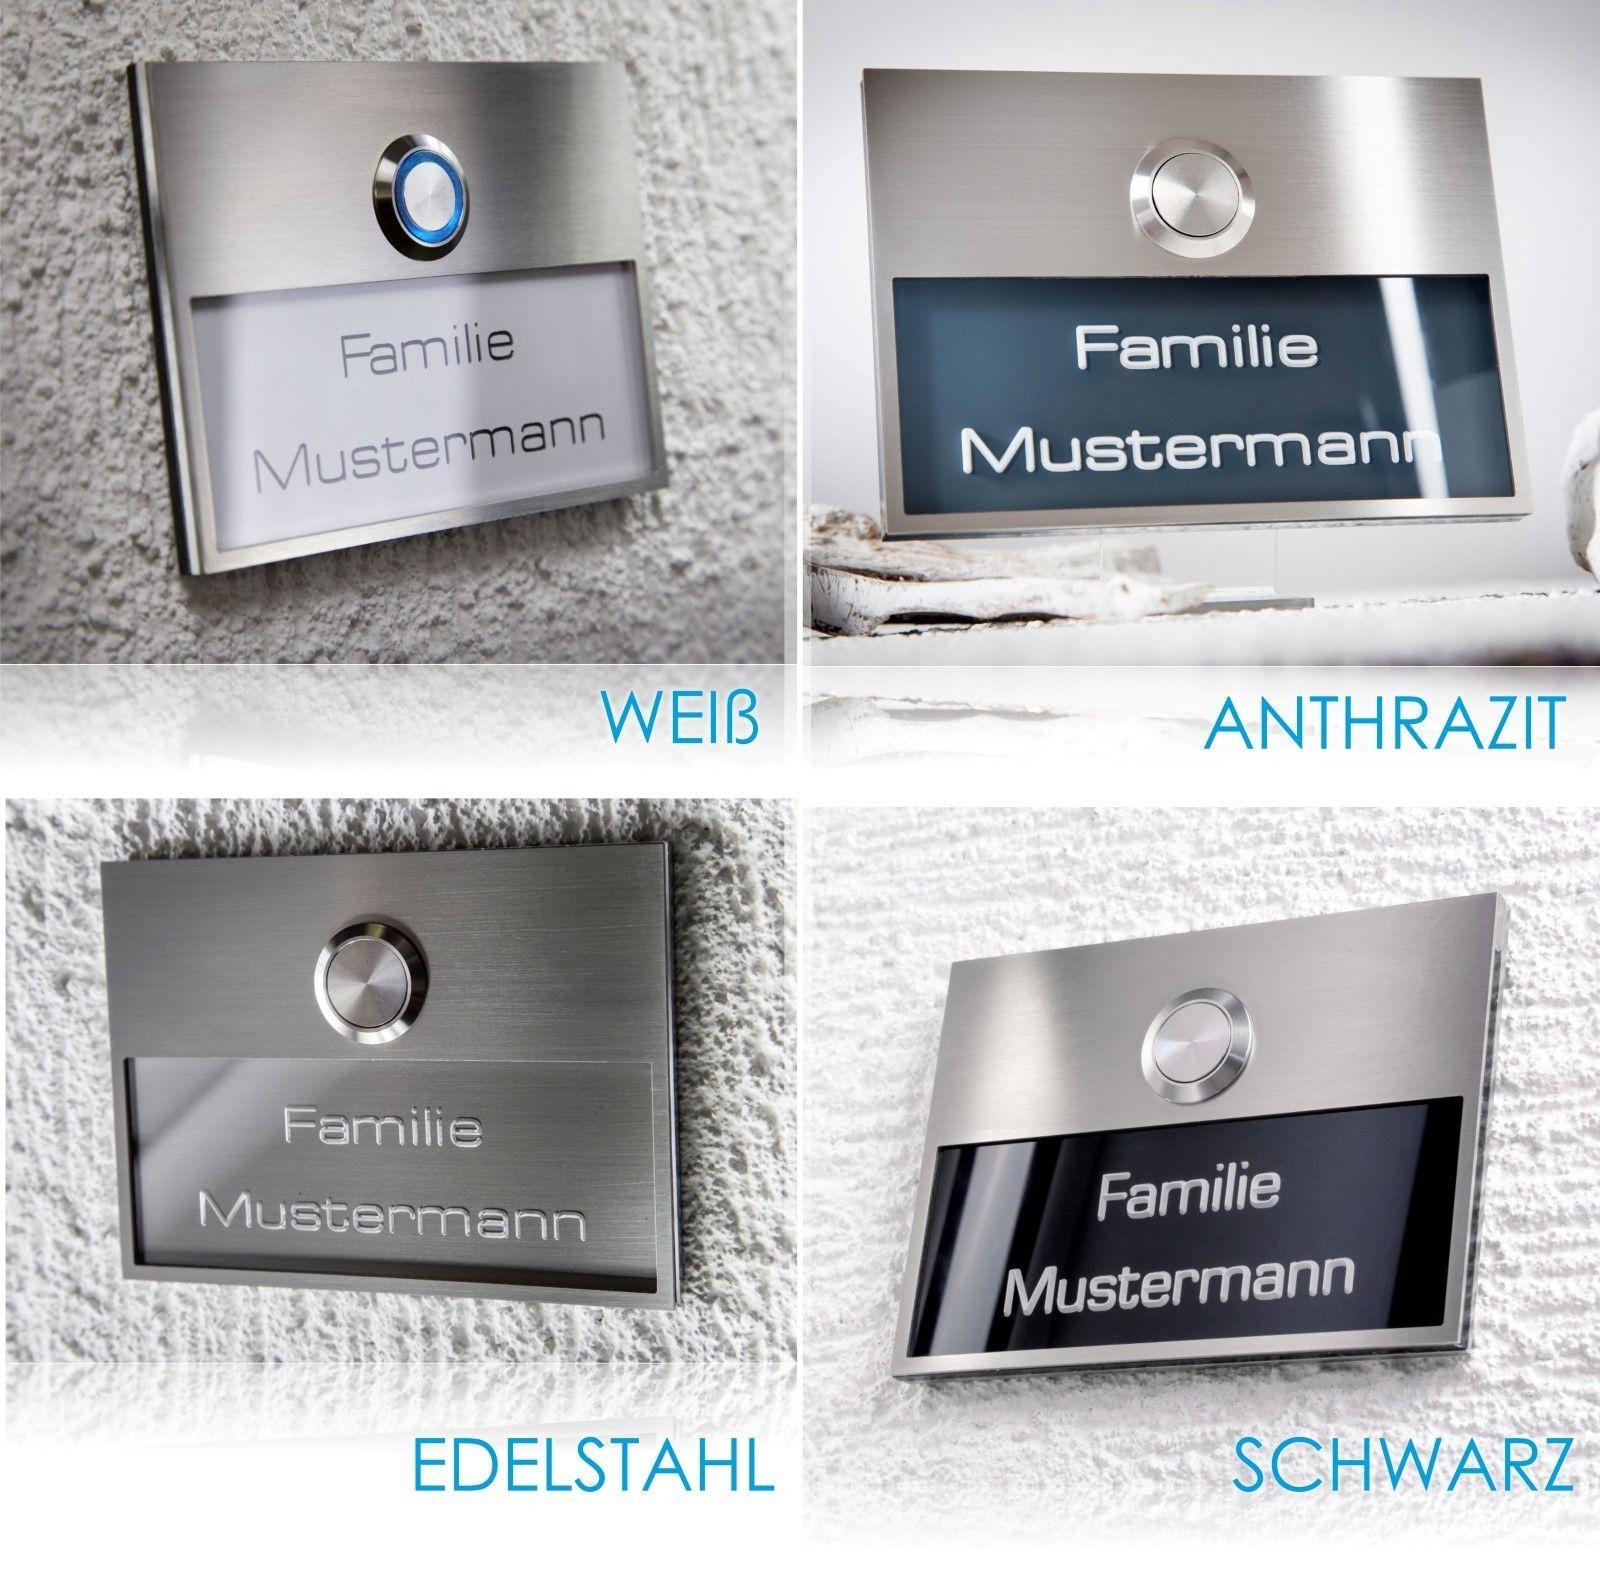 Türklingel Klingelplatte Edelstahl Schwarz Beschriftung Gravur LED-Klingeltaster